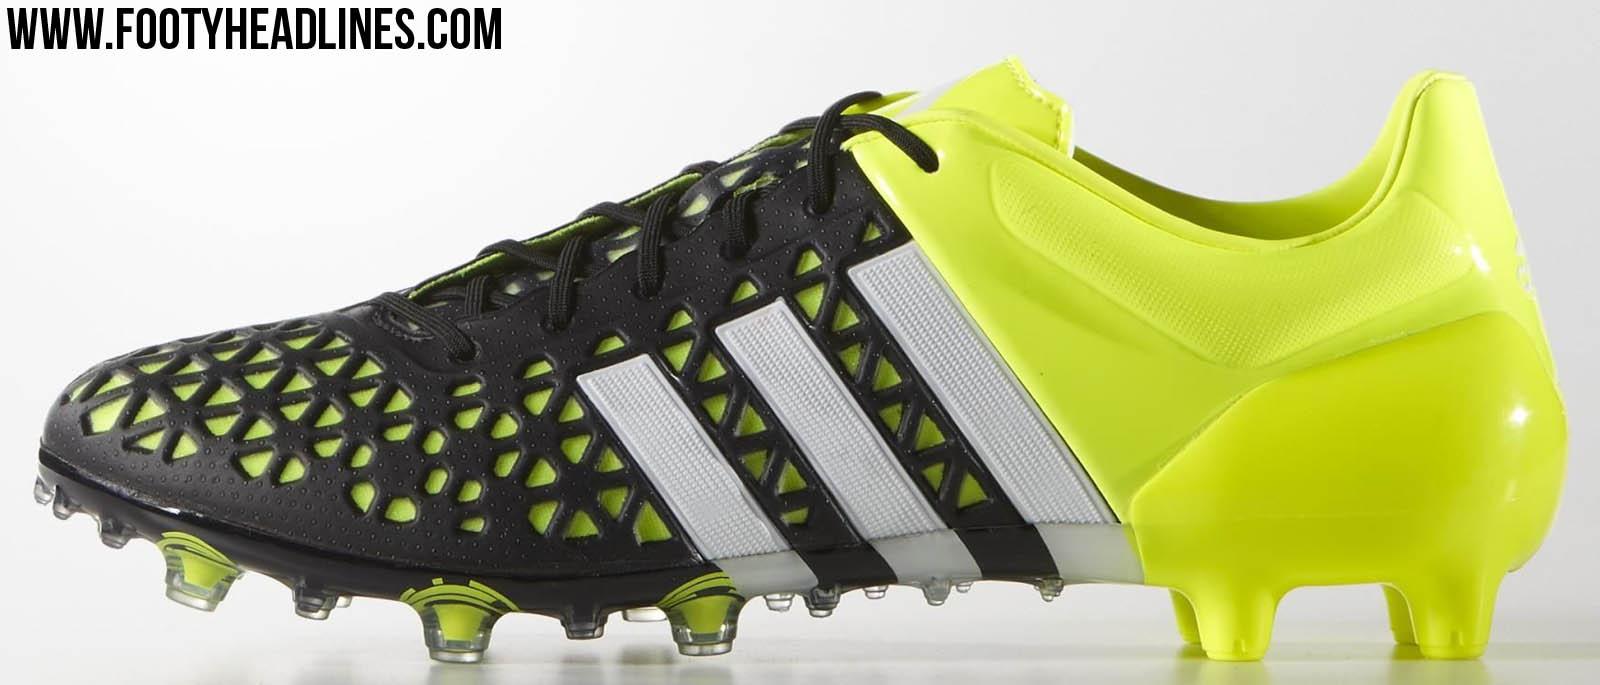 Adida Turf Shoes